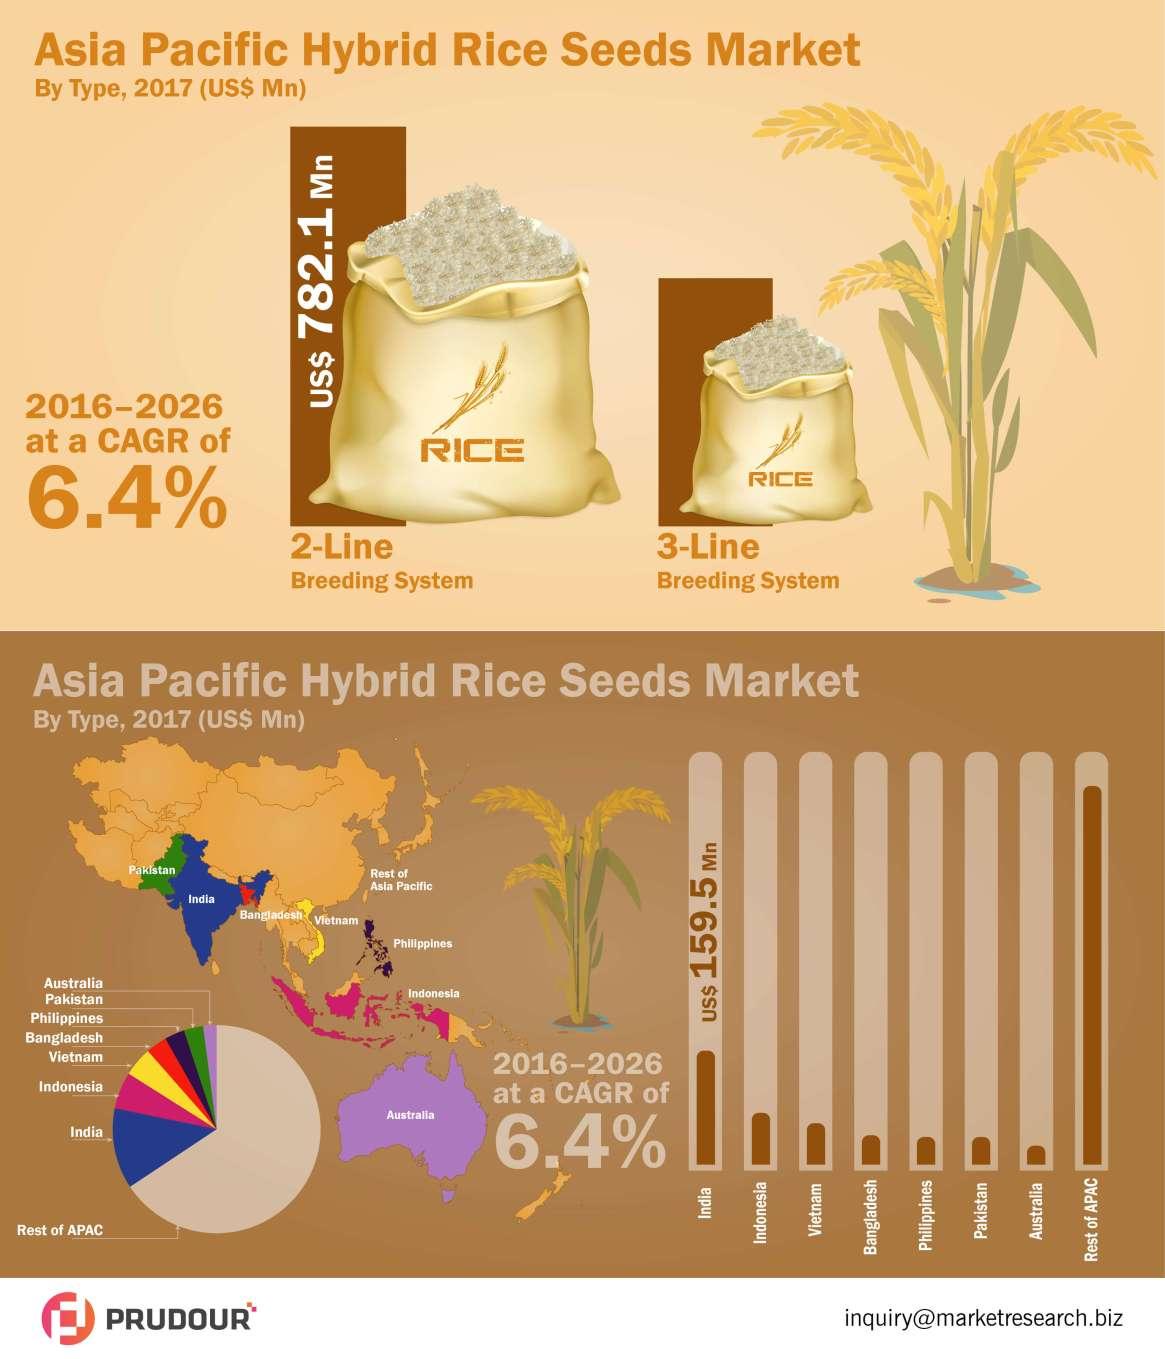 Hybrid Rice Seeds Market Witnessed CAGR of Over 6.4% During 2017-2026